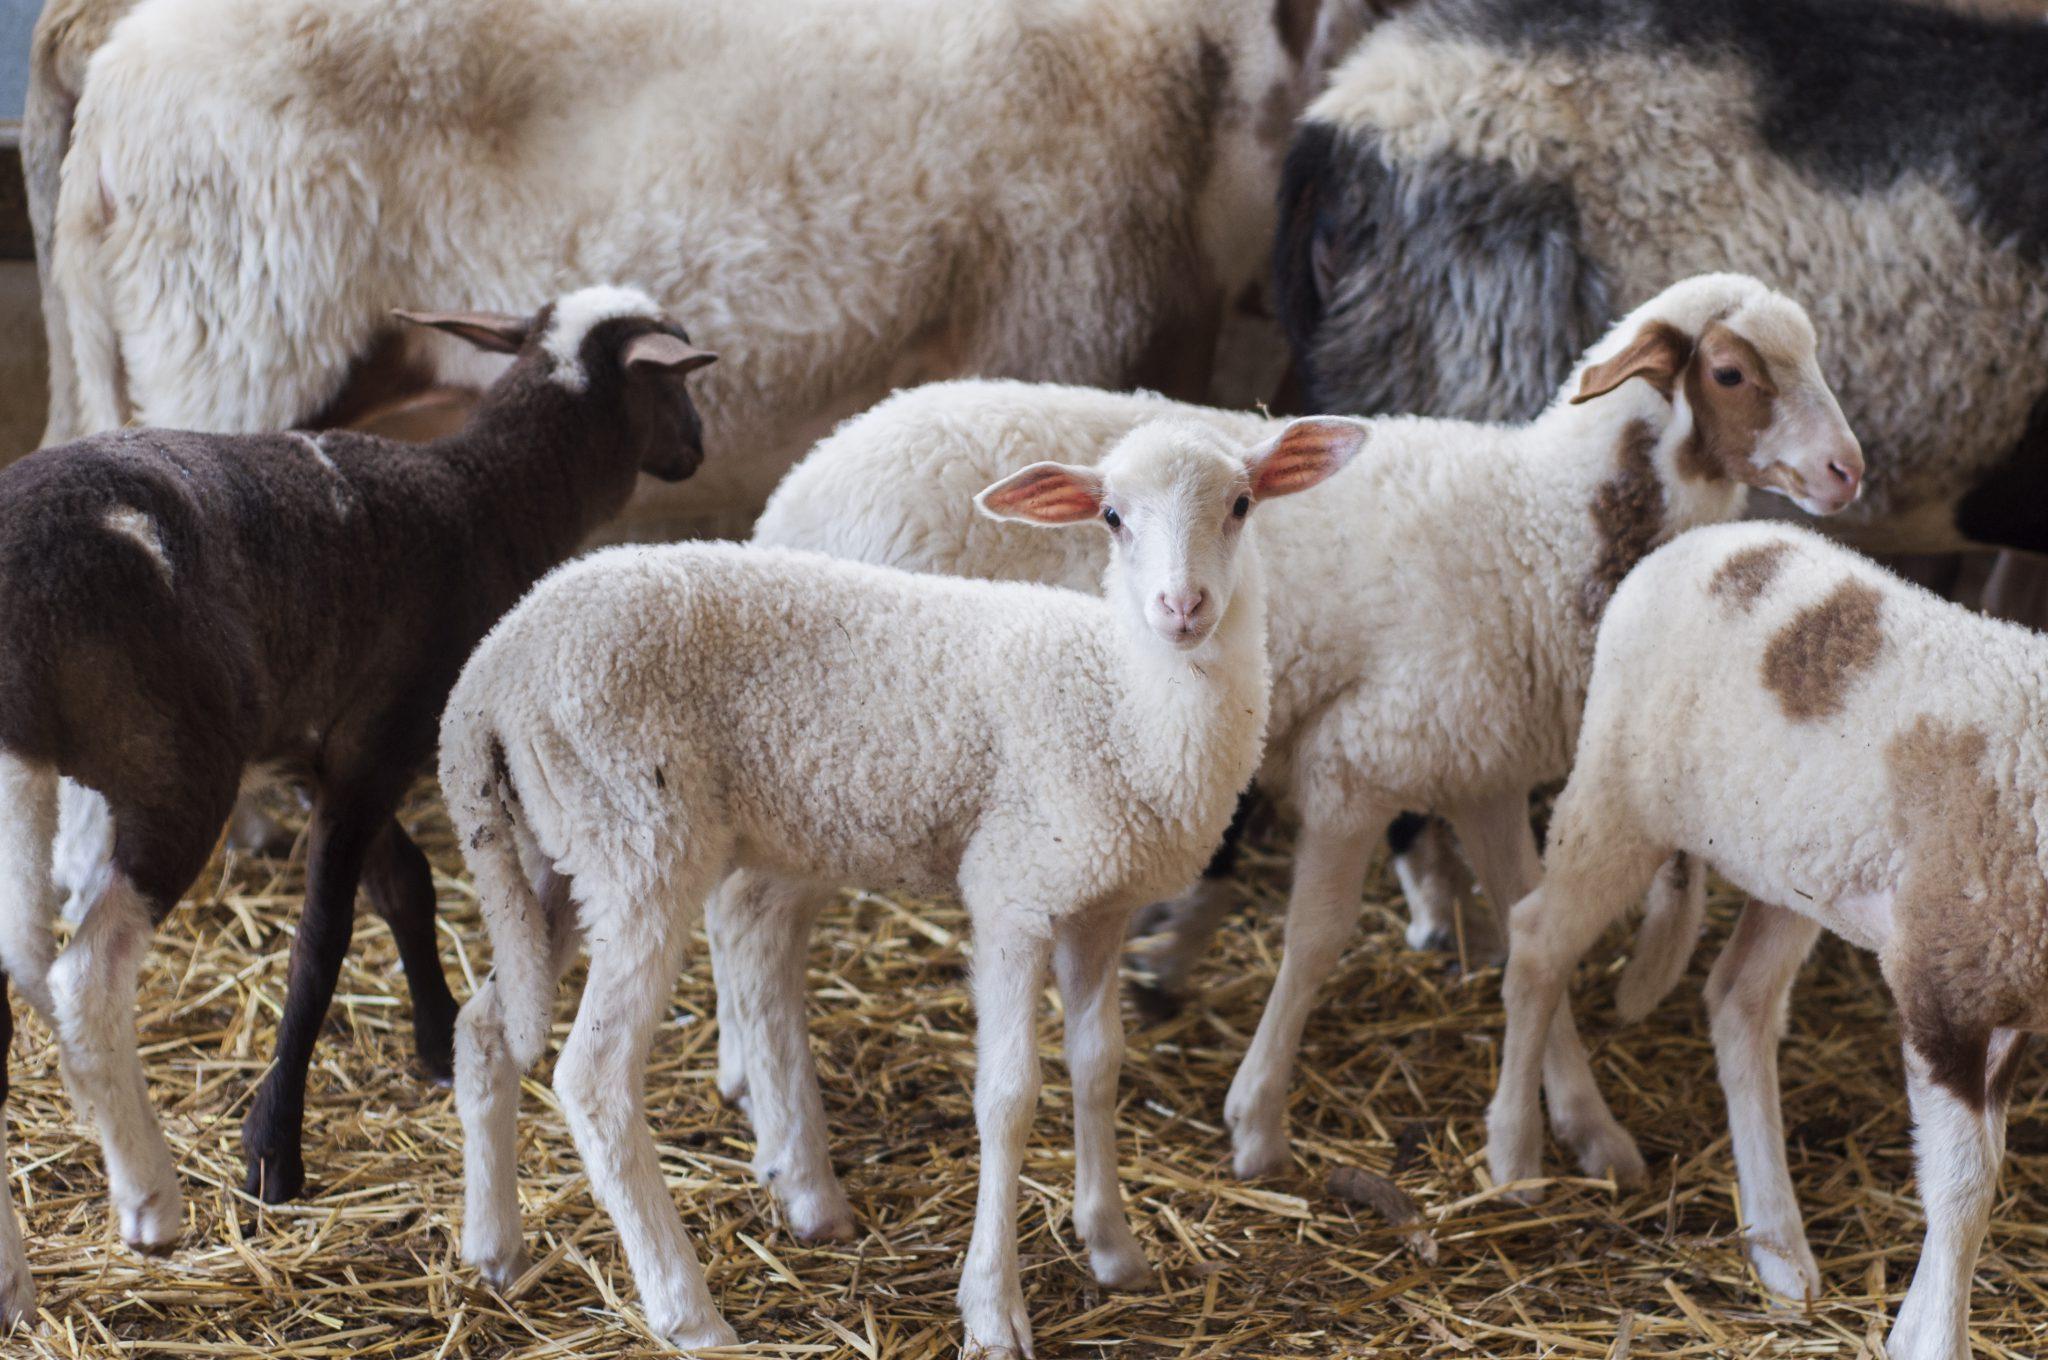 Sheep farm tours